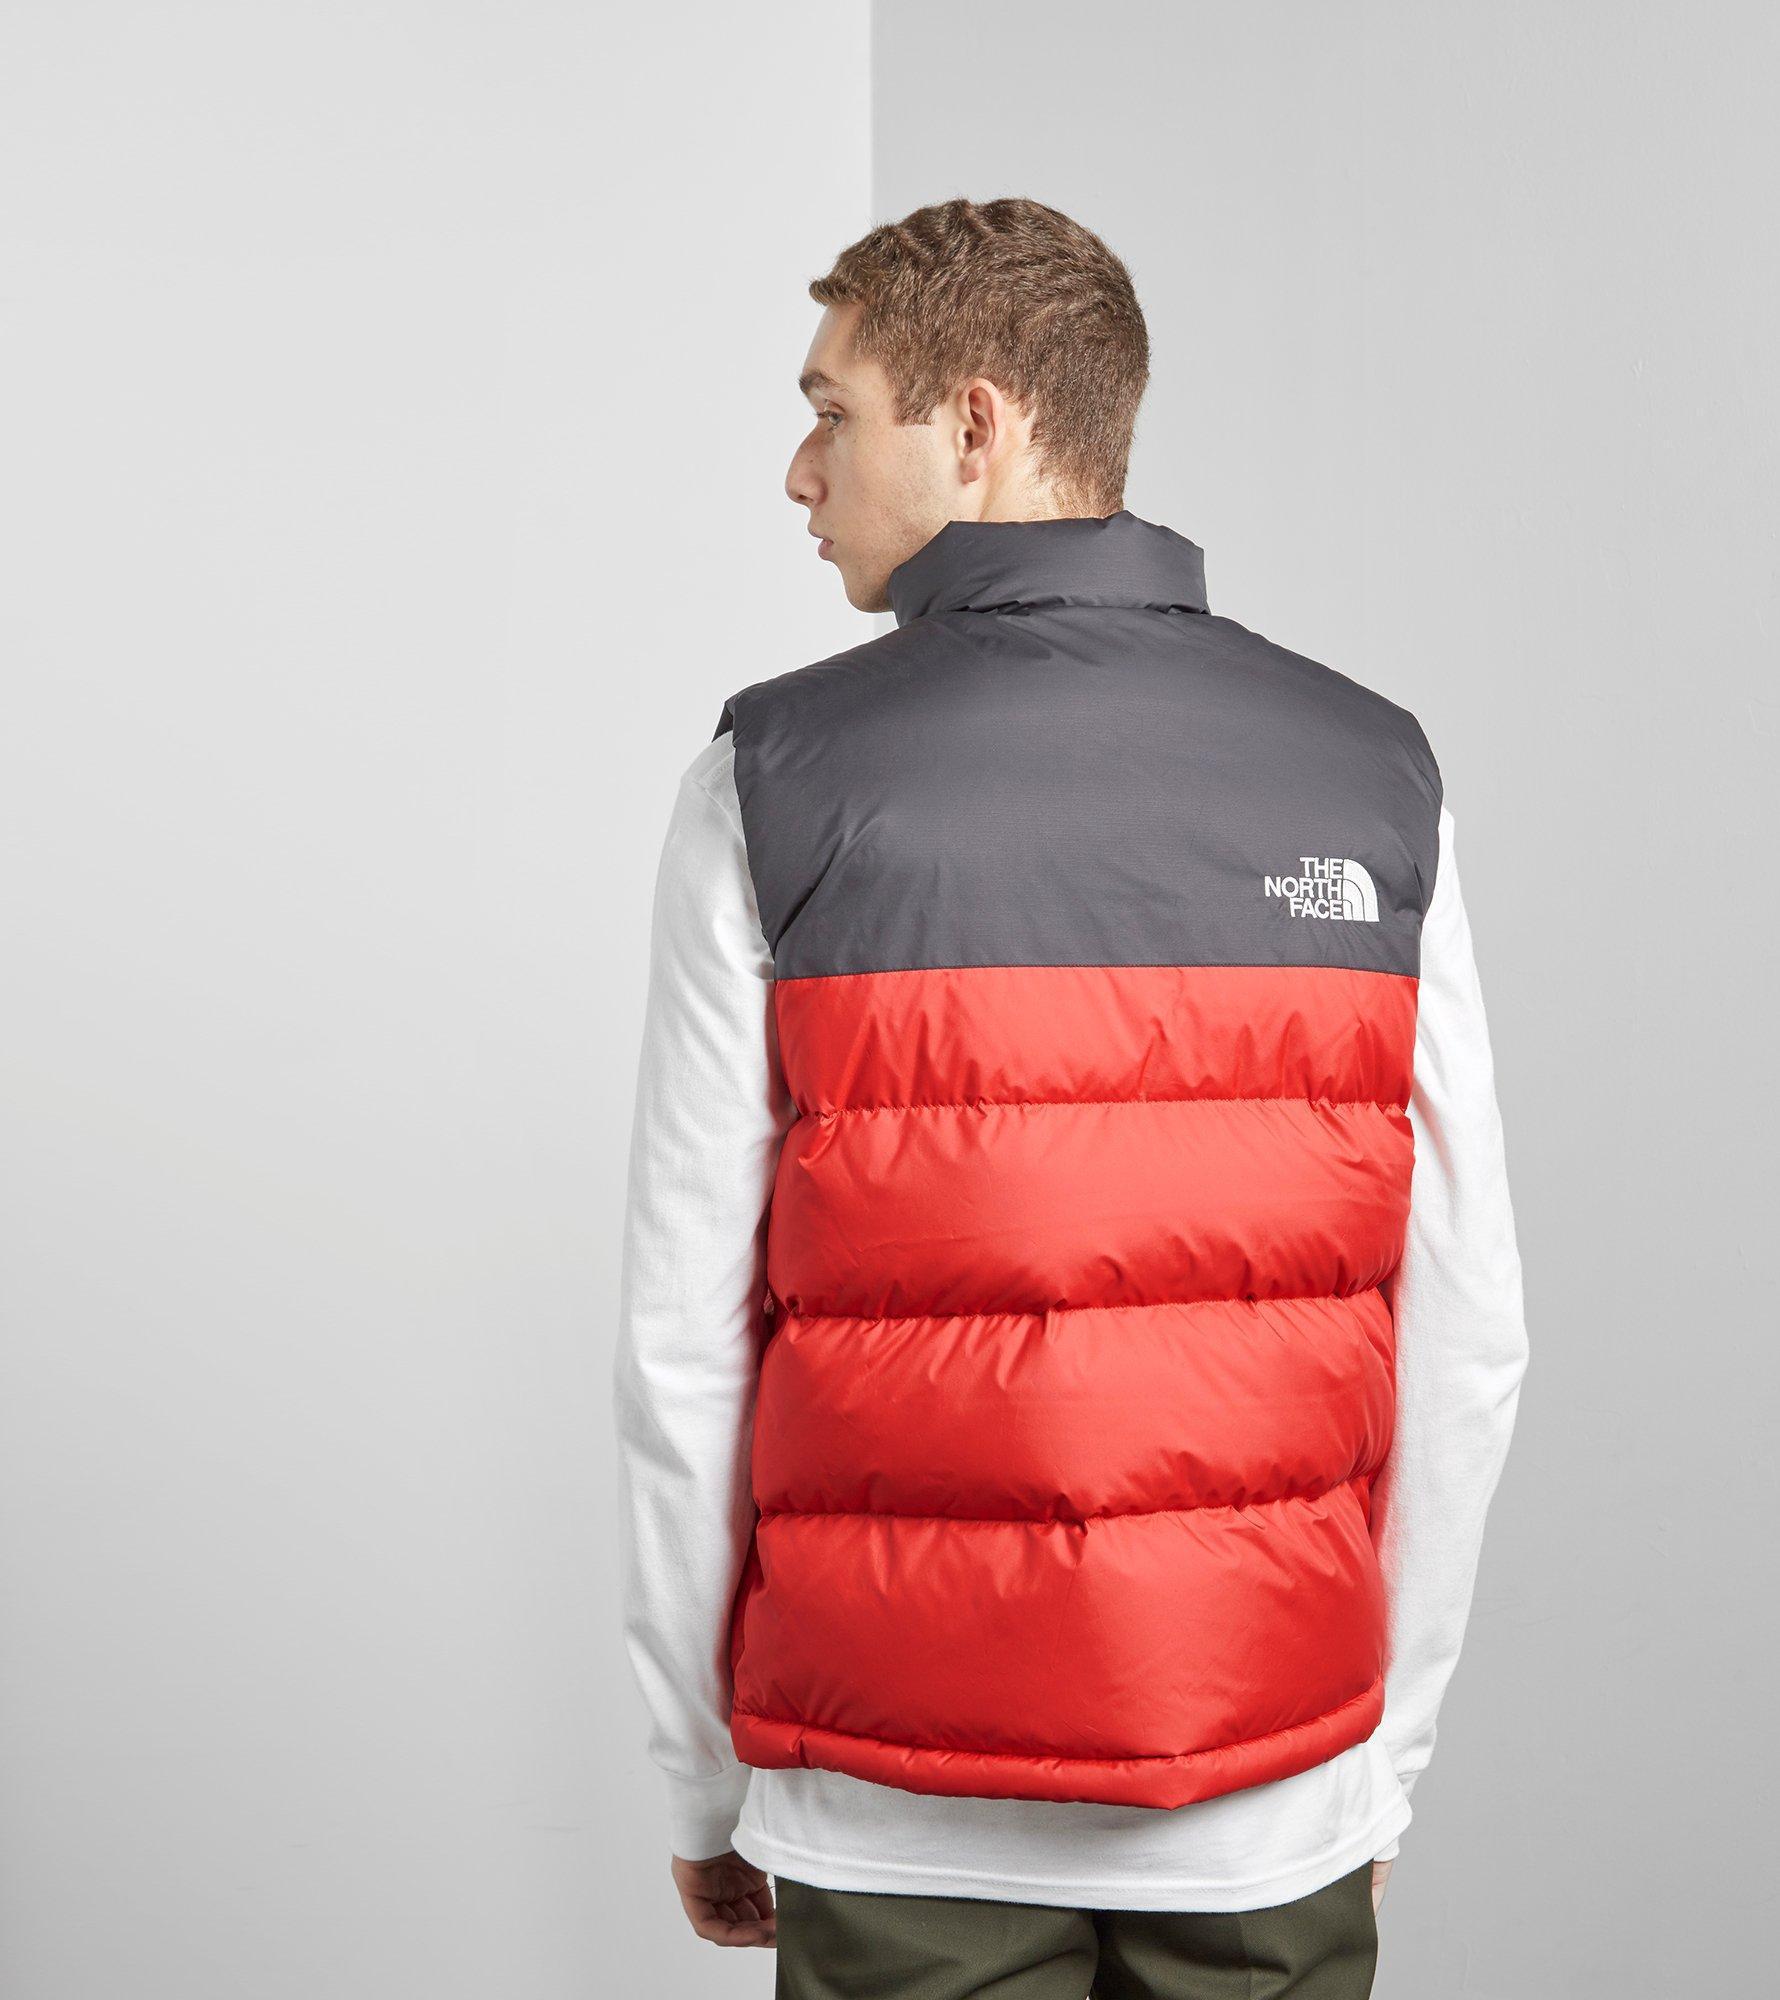 5e0249516 canada the north face m 1992 nuptse jacket red black cf1d8 1ea0e